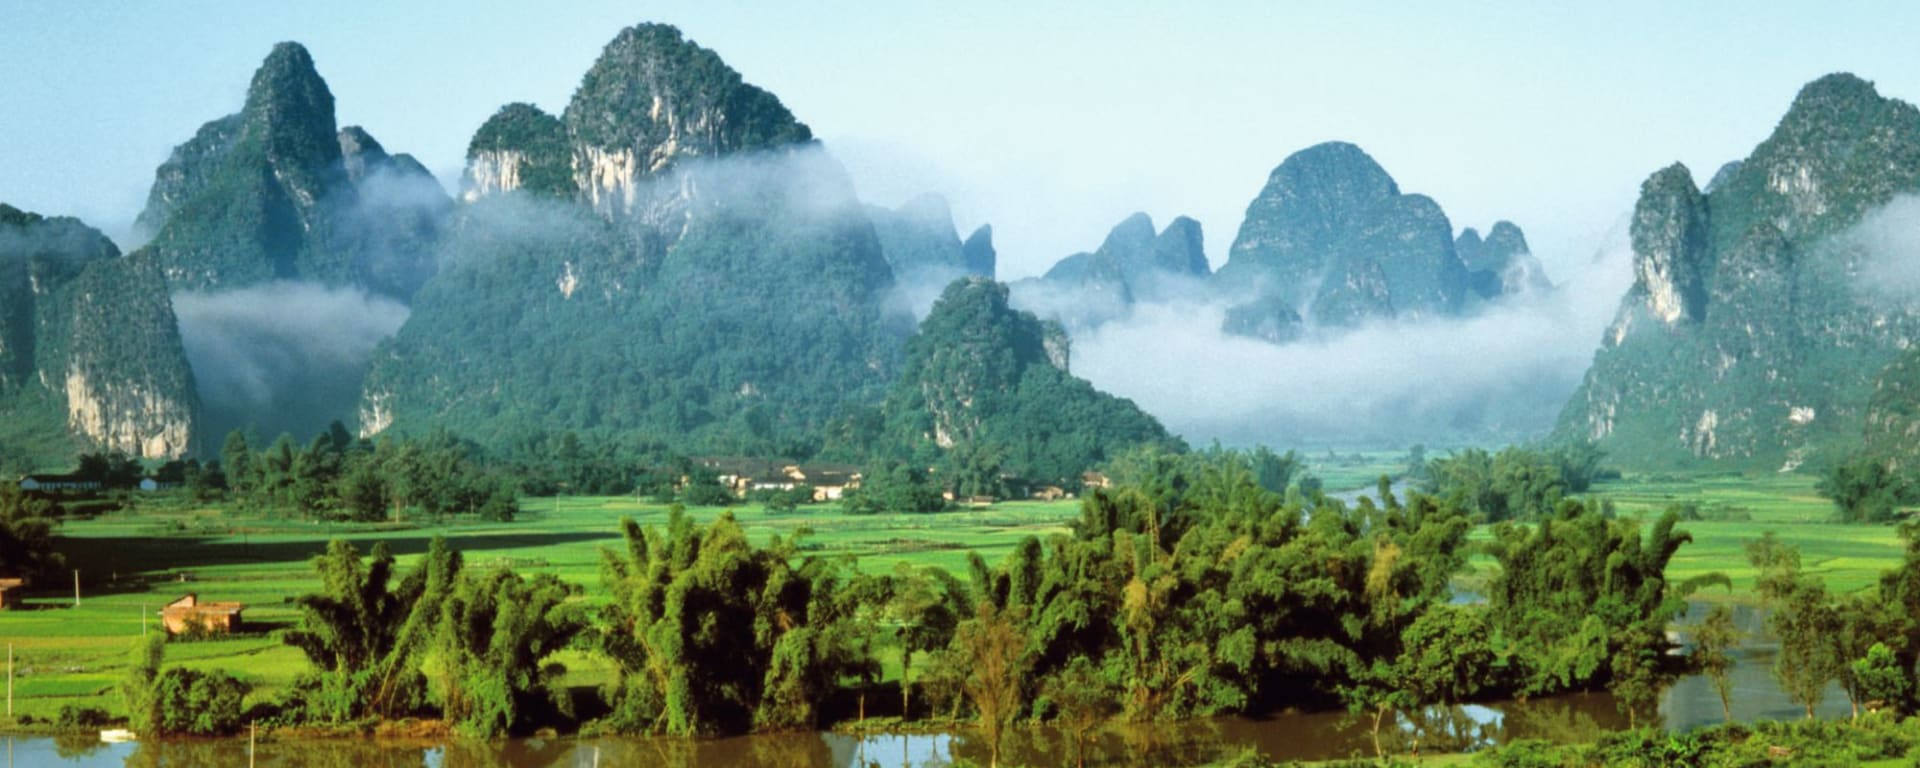 Reisterrassen & Bizarre Berglandschaften ab Guilin: Guilin: Landscapes